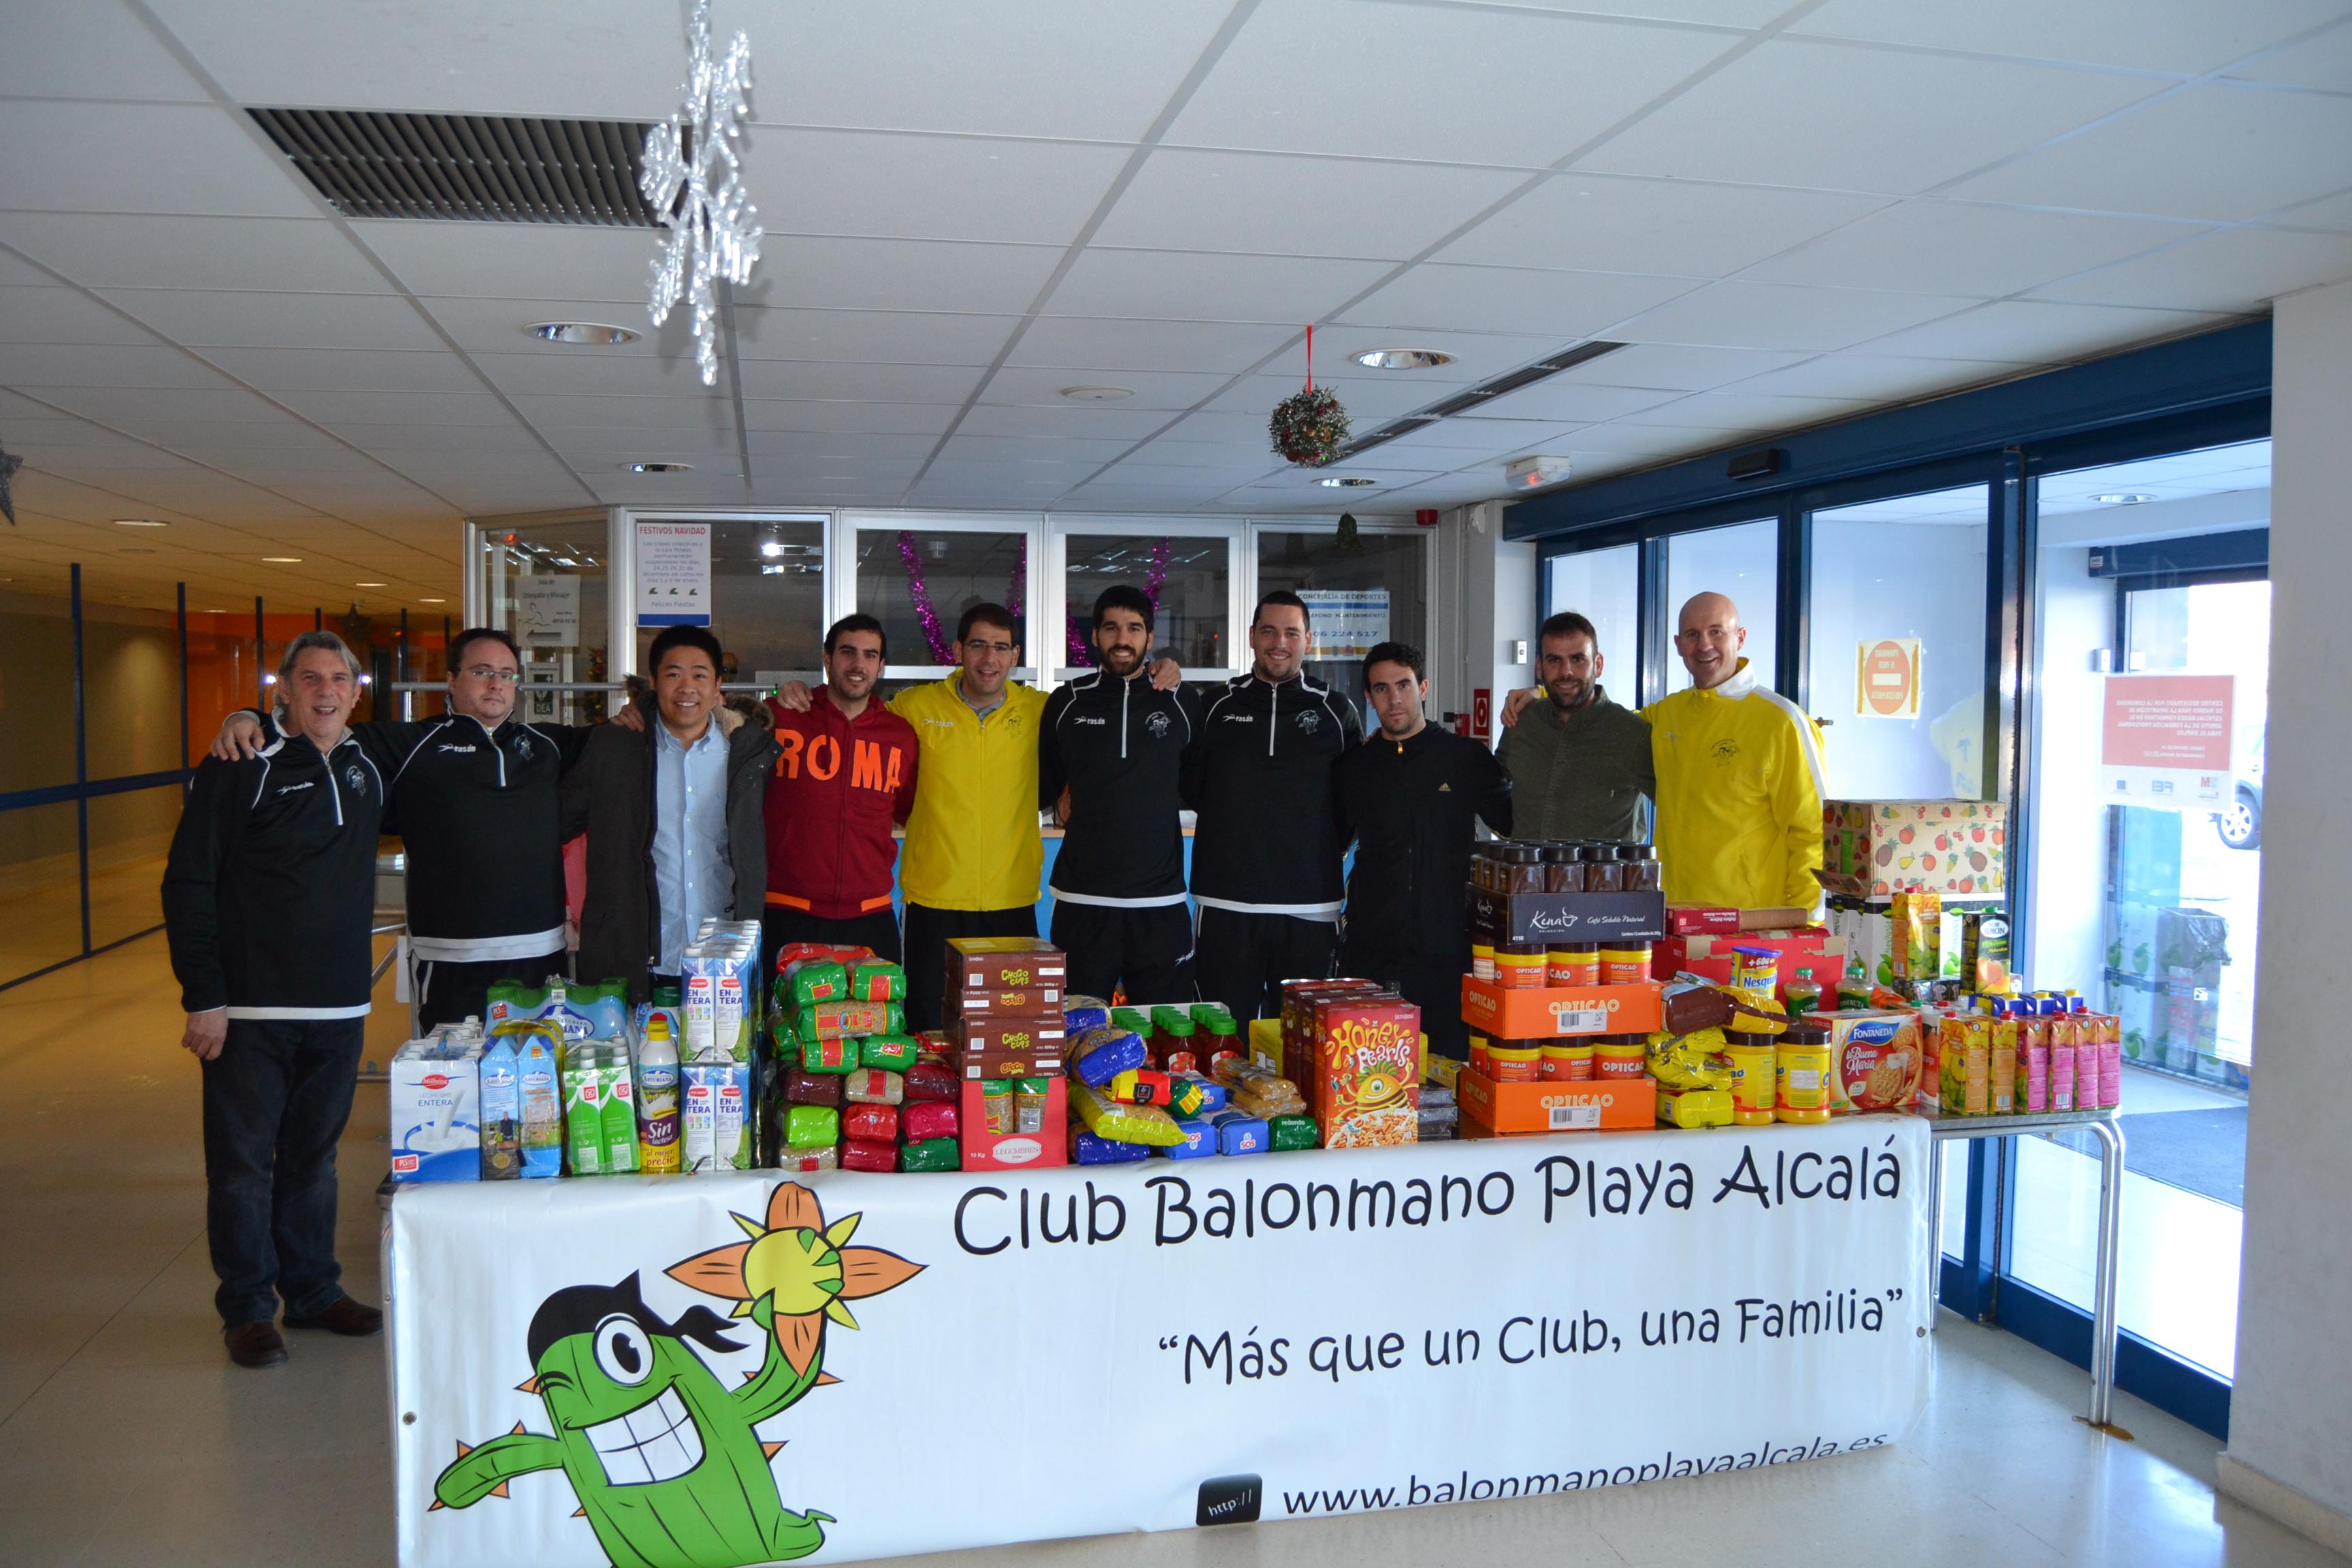 CLUB DEPORTIVO BASICO BALONMANO PLAYA ALCALA